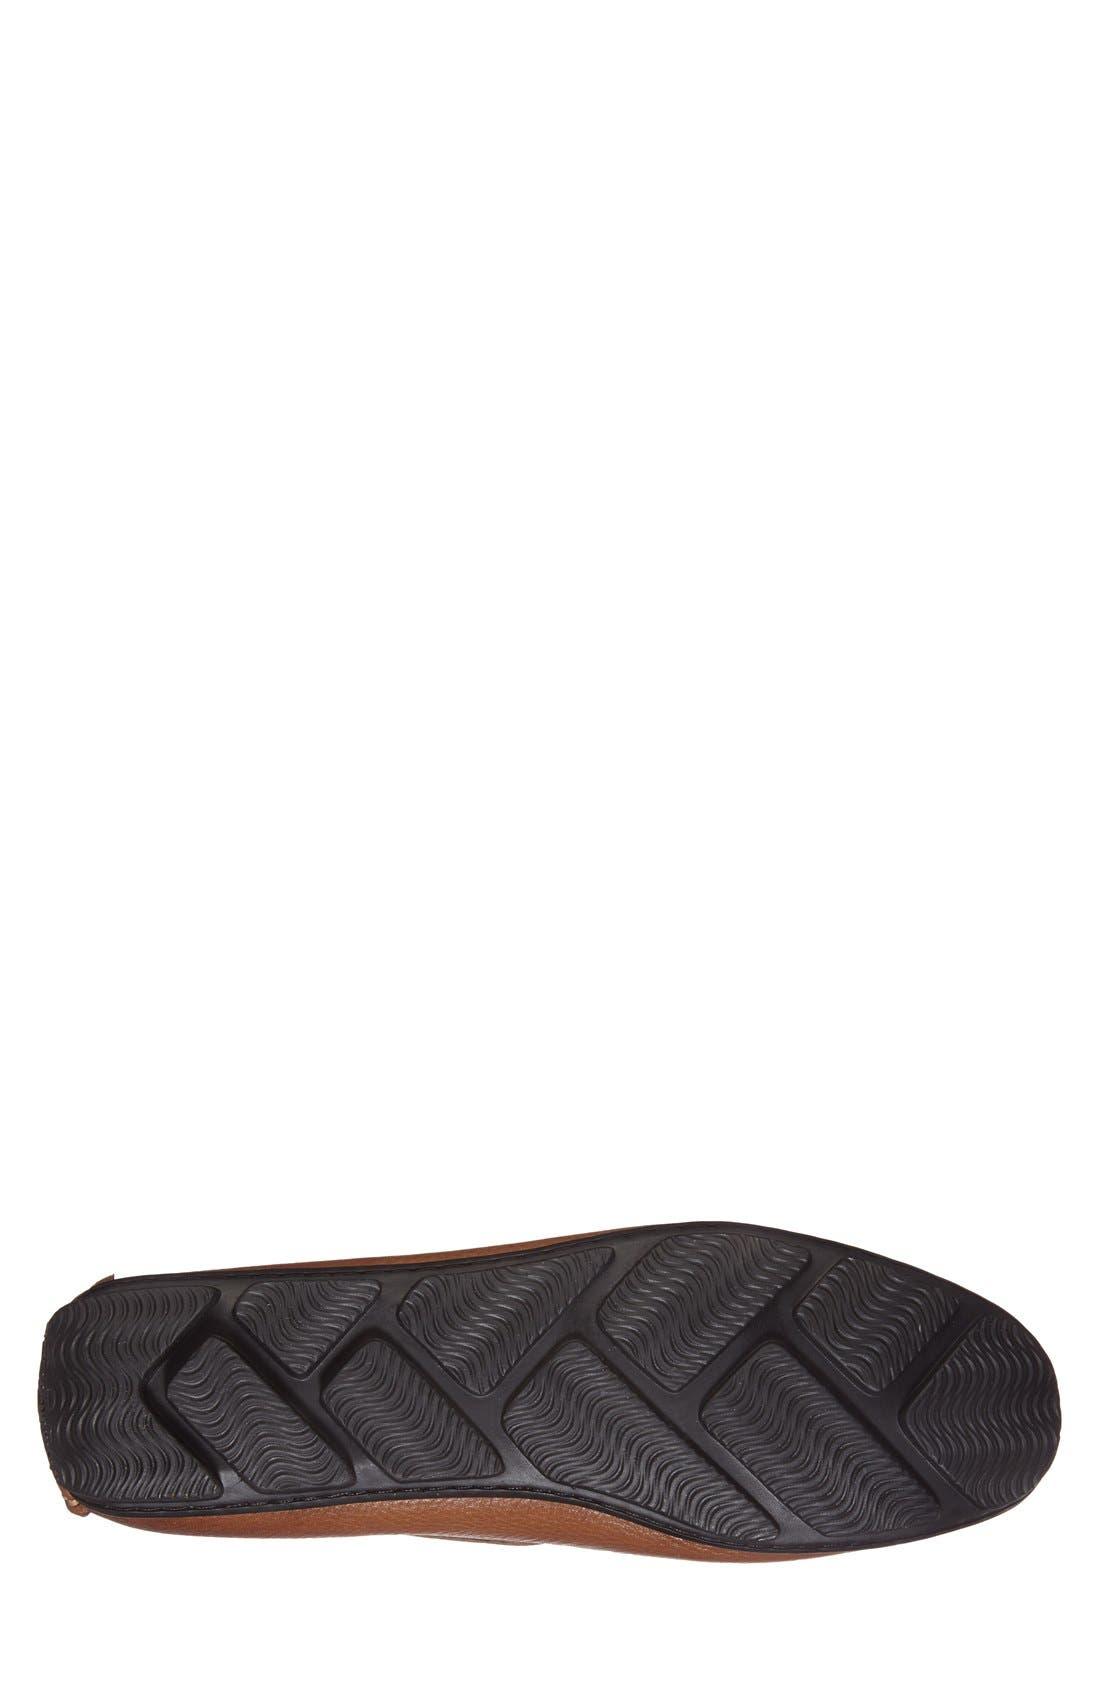 Olinda Driver,                             Alternate thumbnail 4, color,                             Cognac Leather